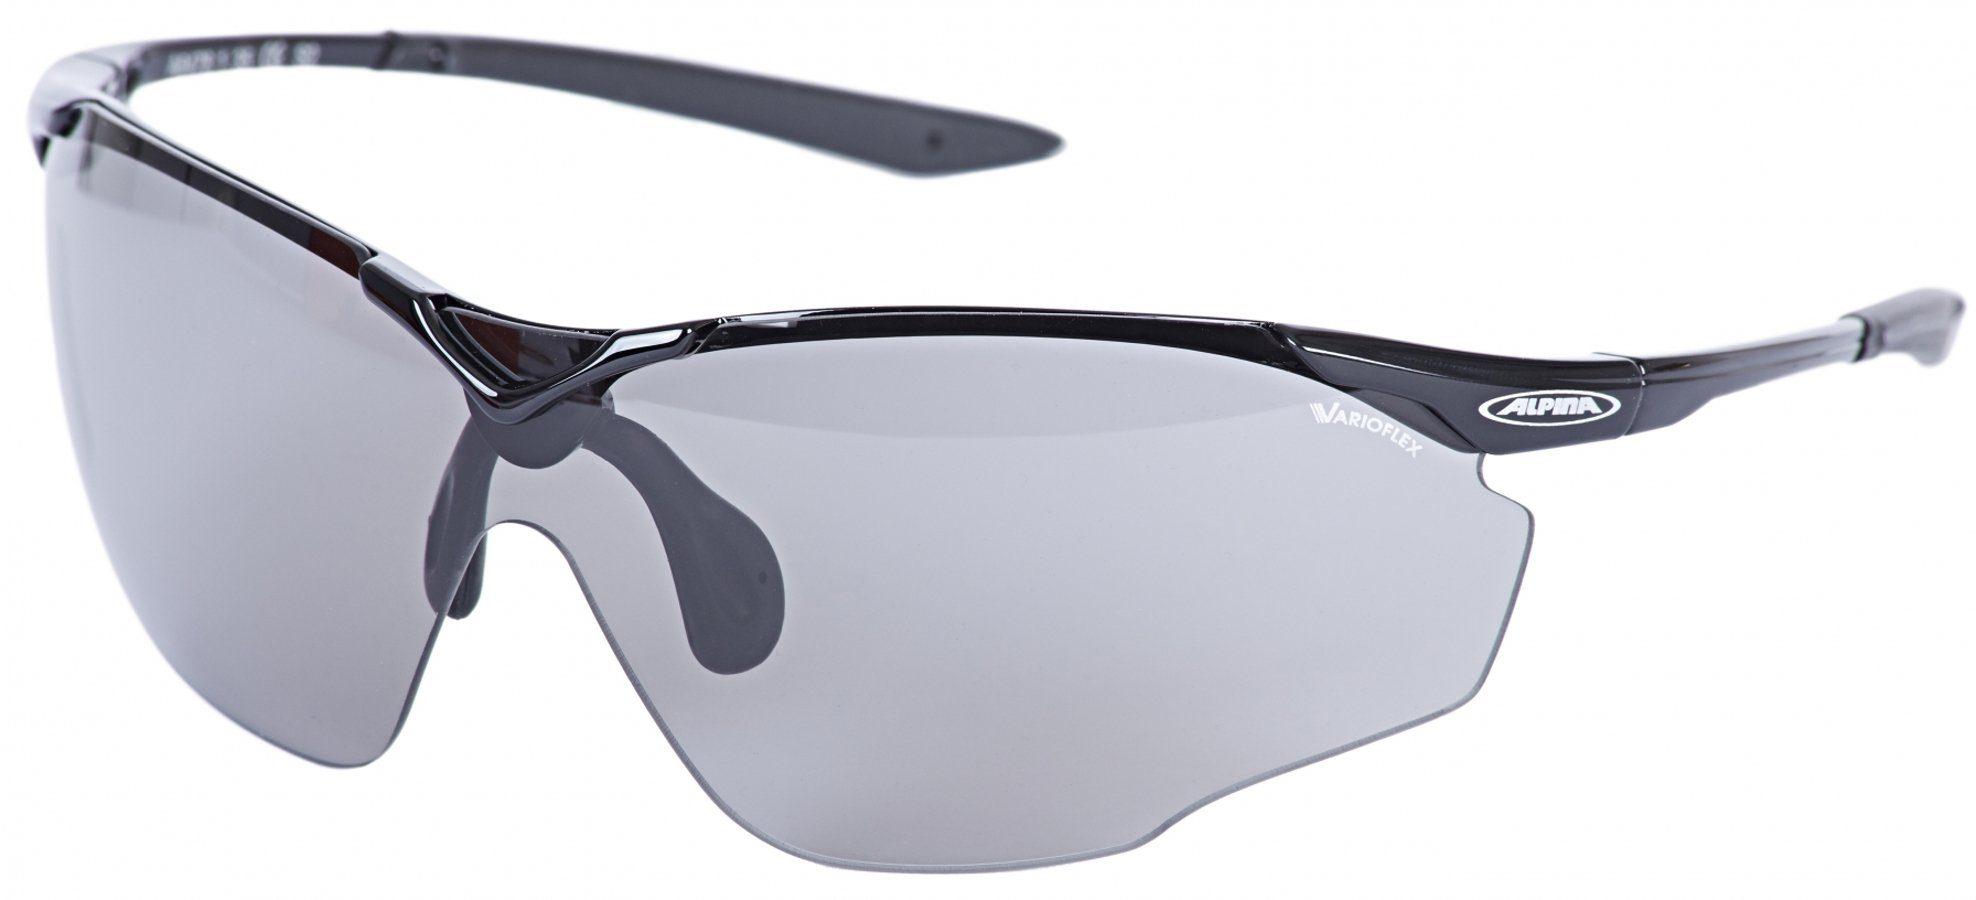 Alpina Radsportbrille »Splinter Shield VL«